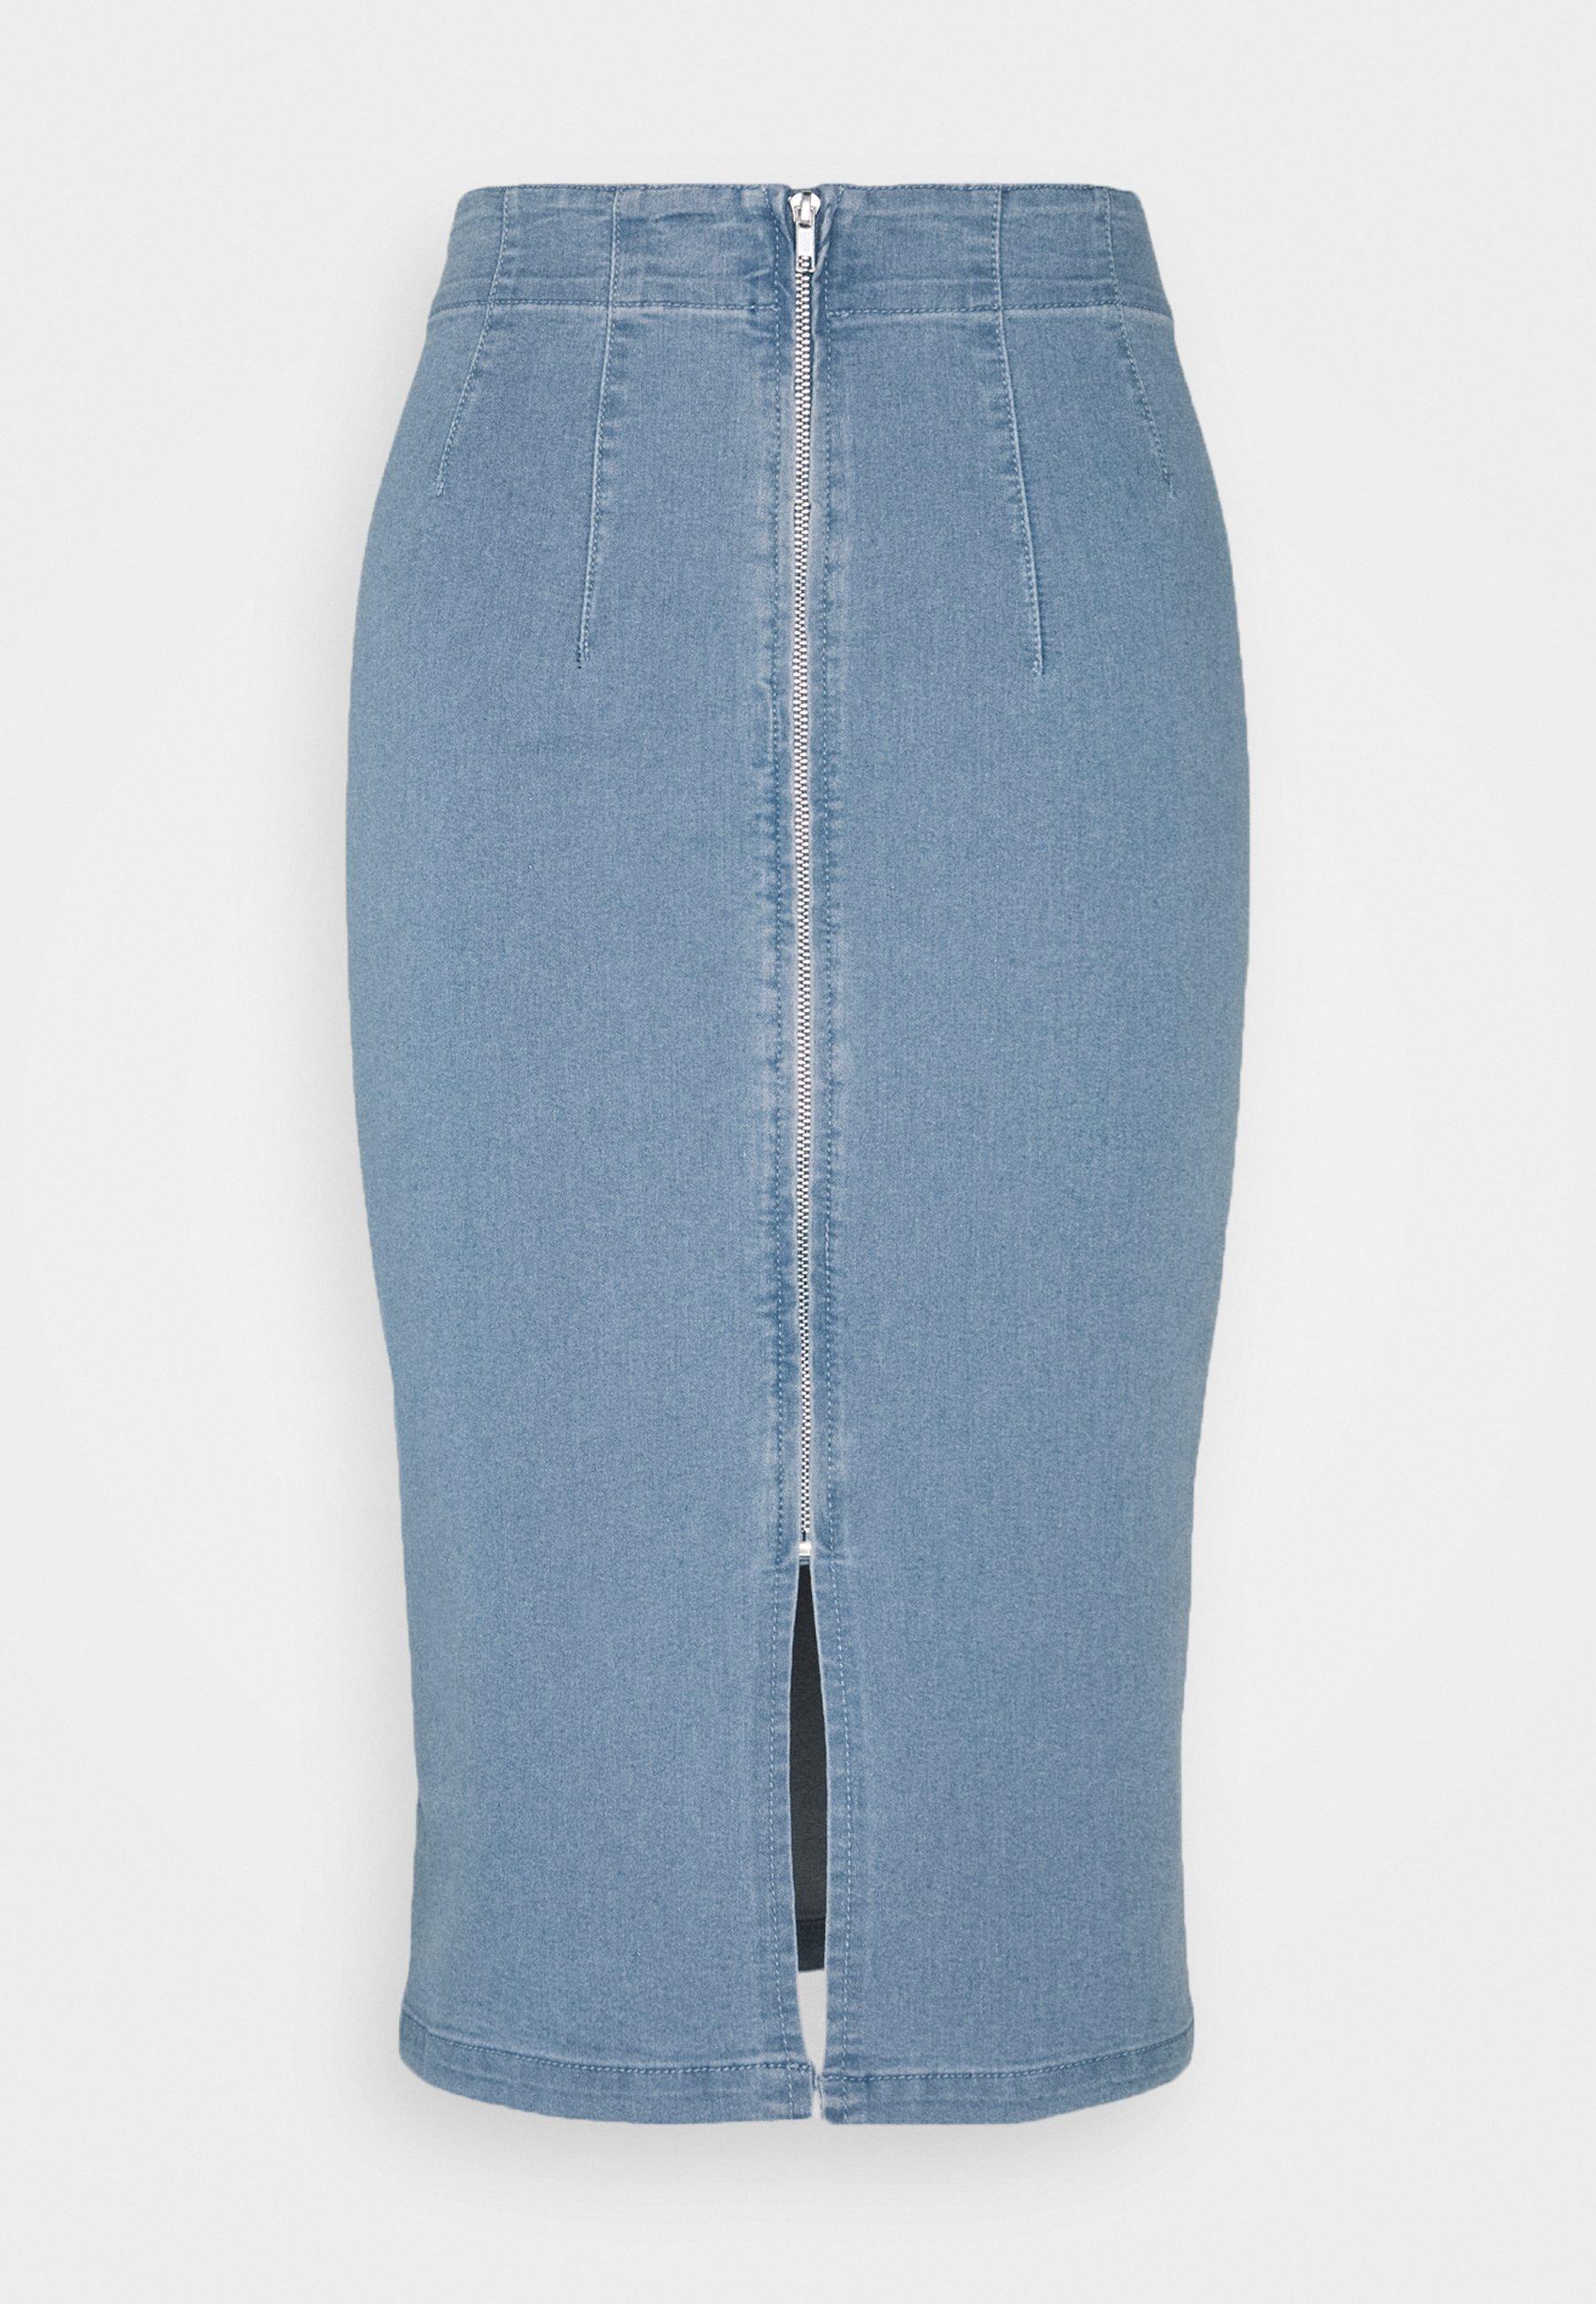 Femme VIFANNI MALLE MIDI SKIRT - Jupe en jean